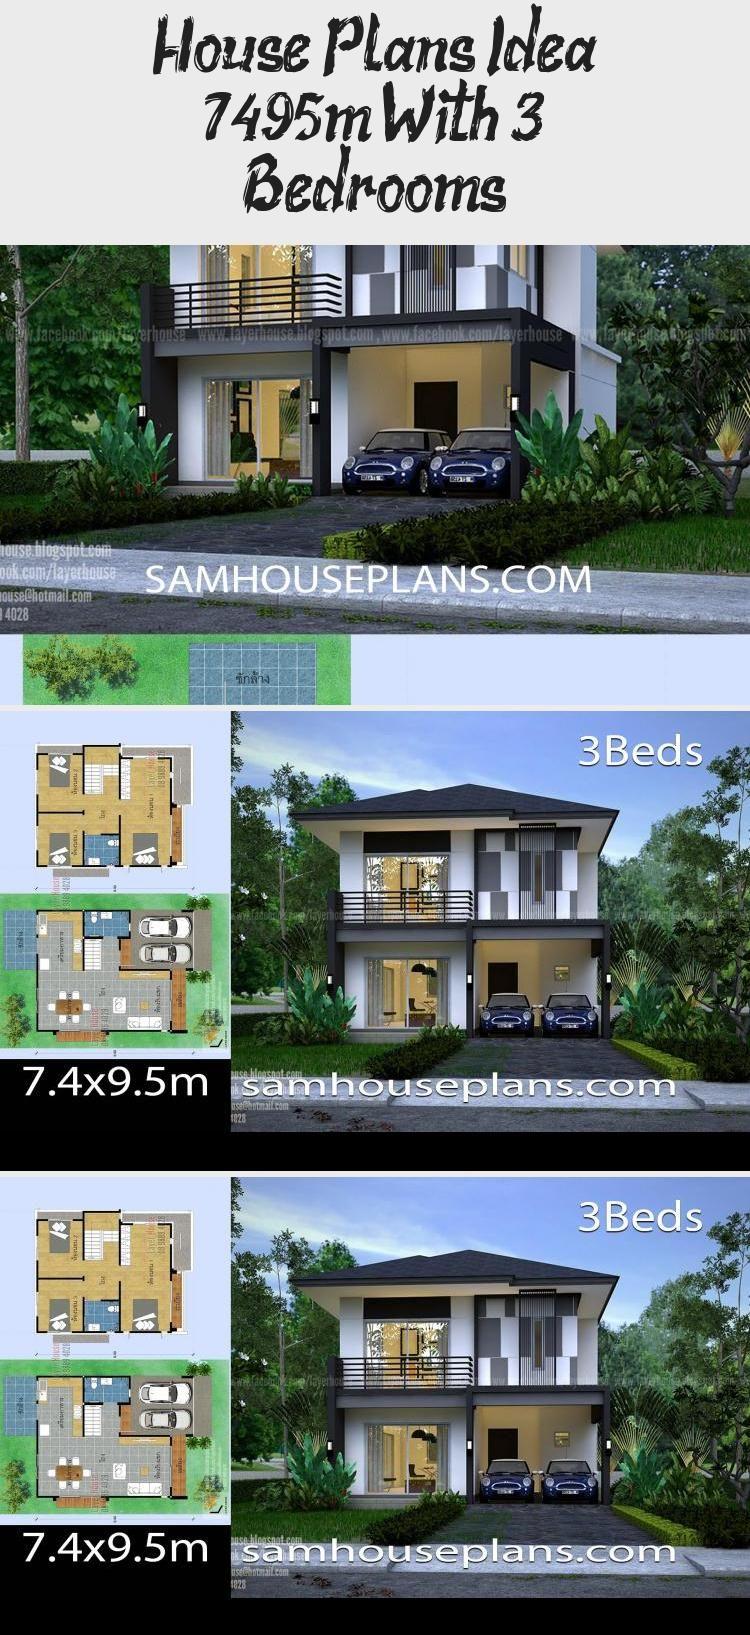 En Blog En Blog In 2020 House Plans Modern House Plans House Plans South Africa